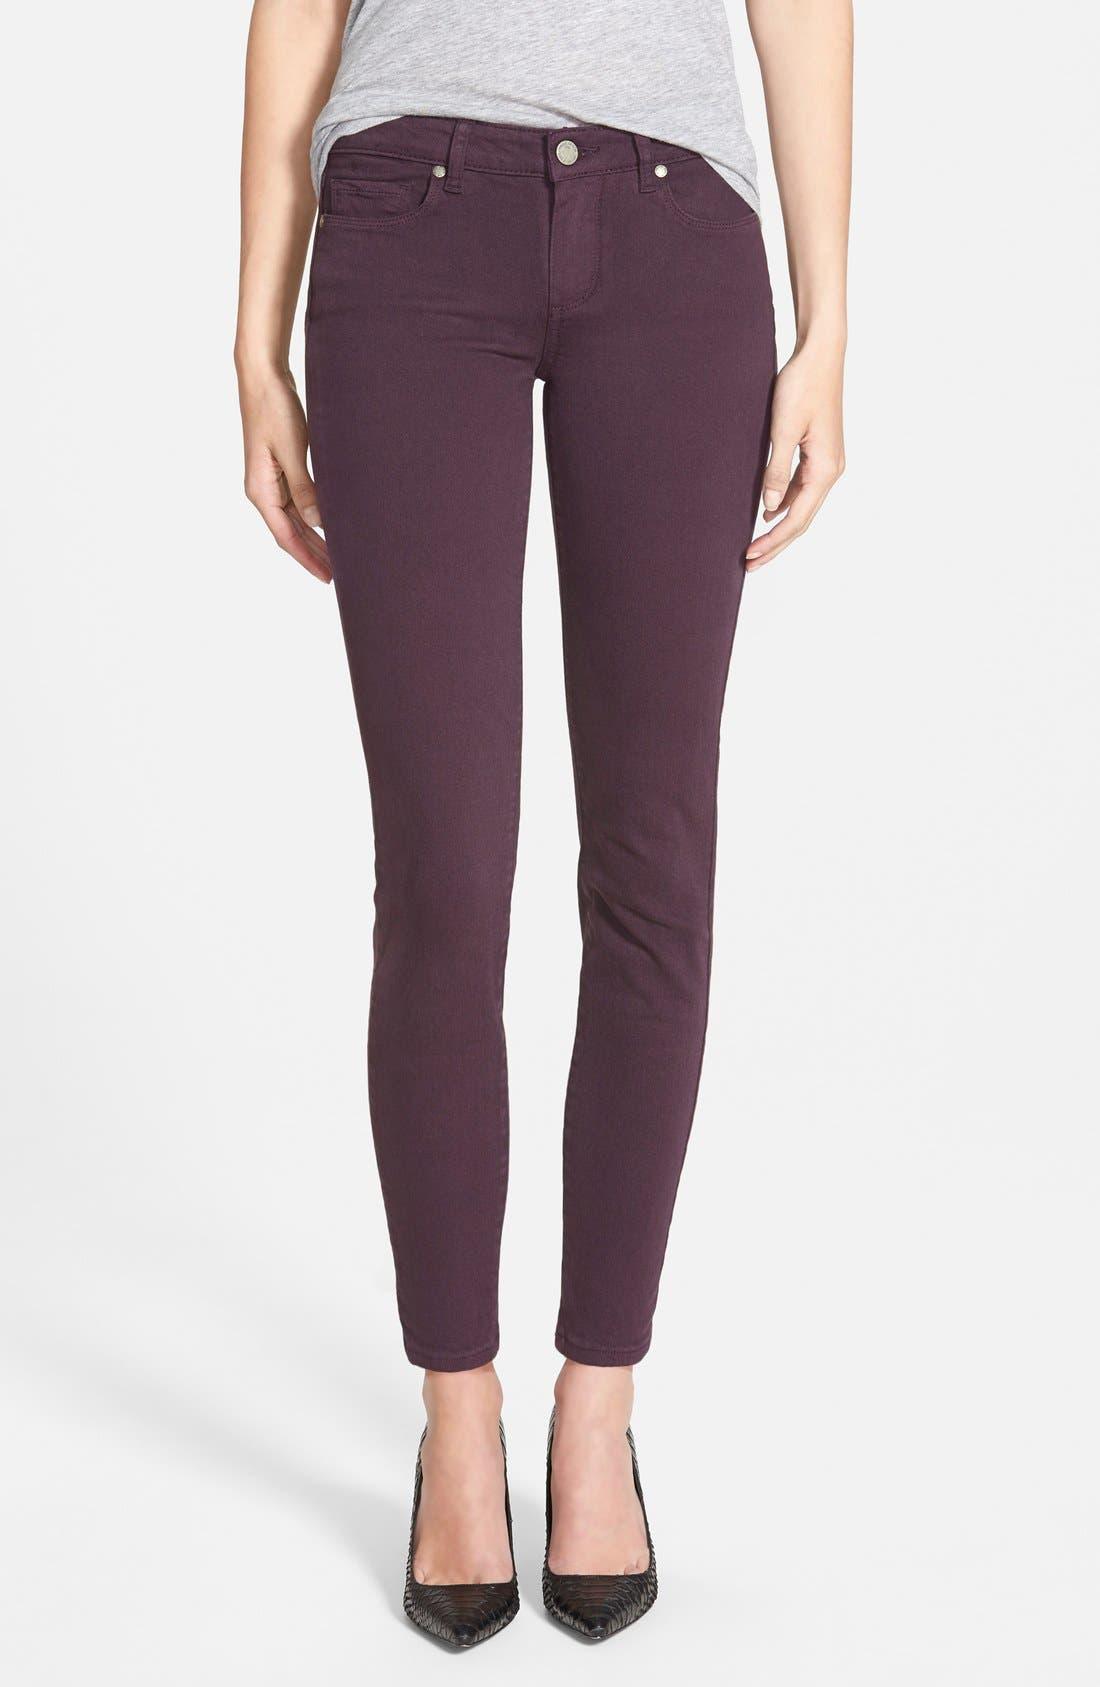 Main Image - Paige Denim 'Verdugo' Ankle Skinny Jeans (Autumn Plum) (Nordstrom Exclusive)